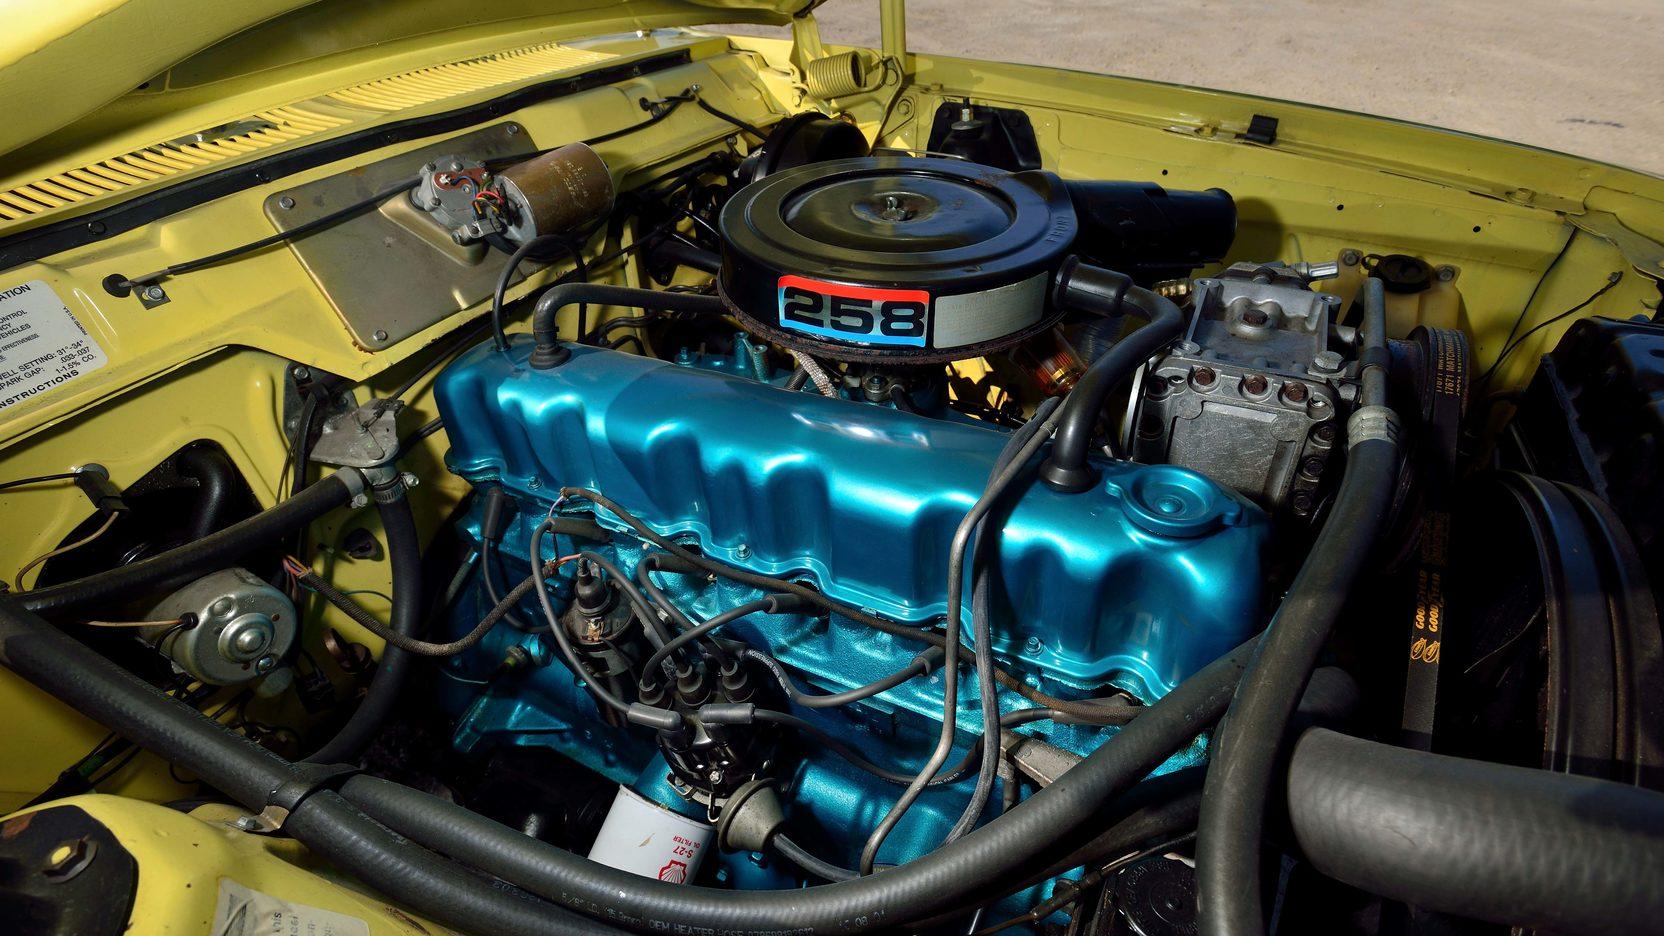 1972 AMC Gremlin engine